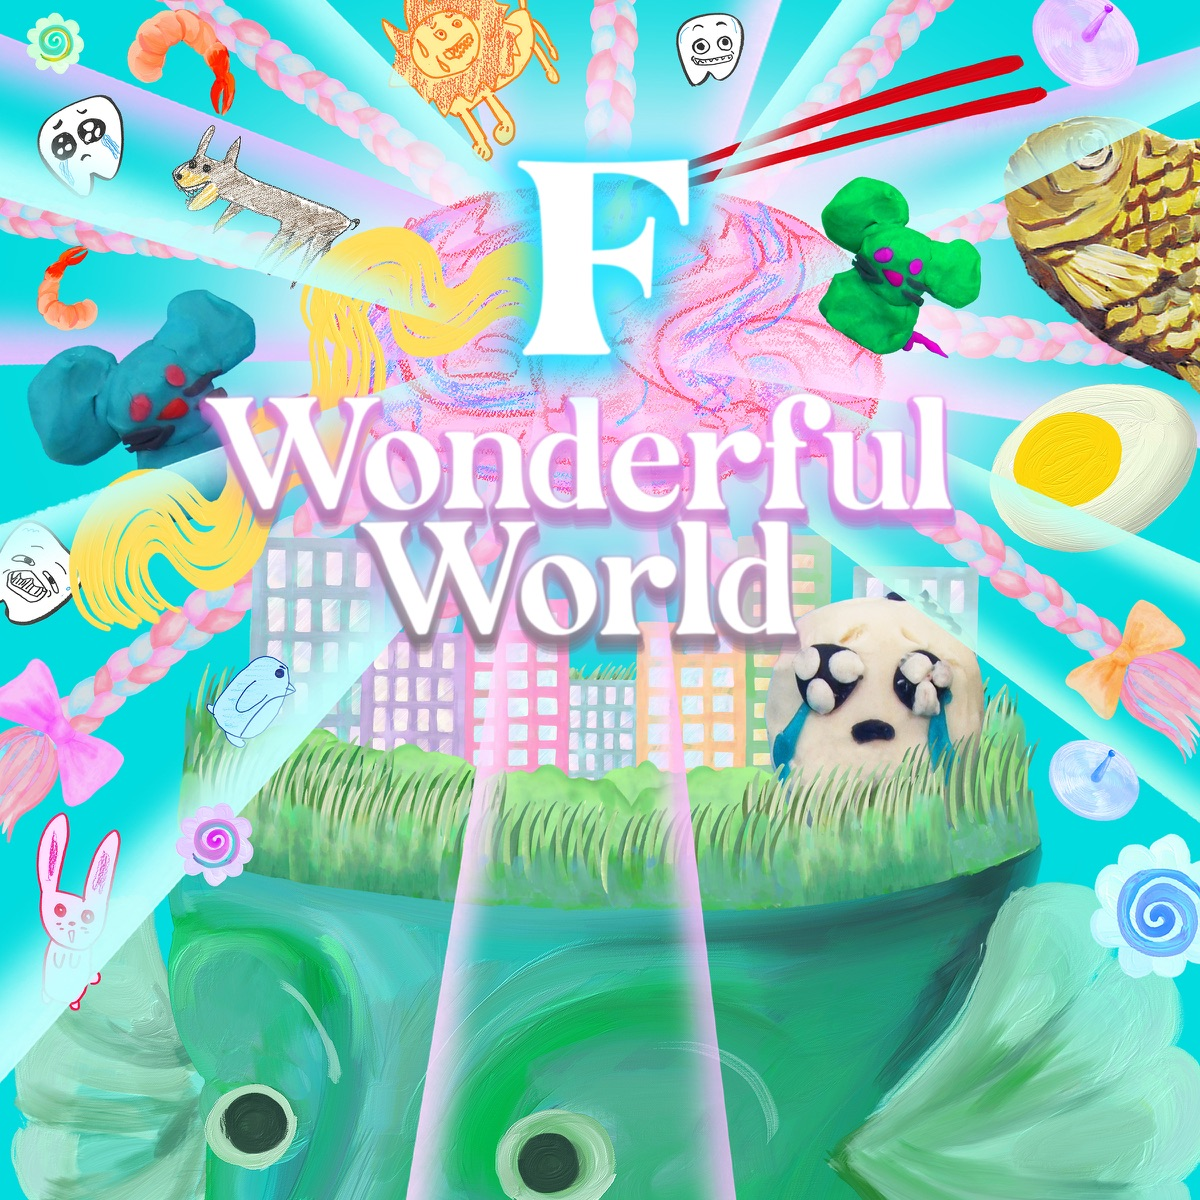 『ano - F Wonderful World』収録の『F Wonderful World』ジャケット